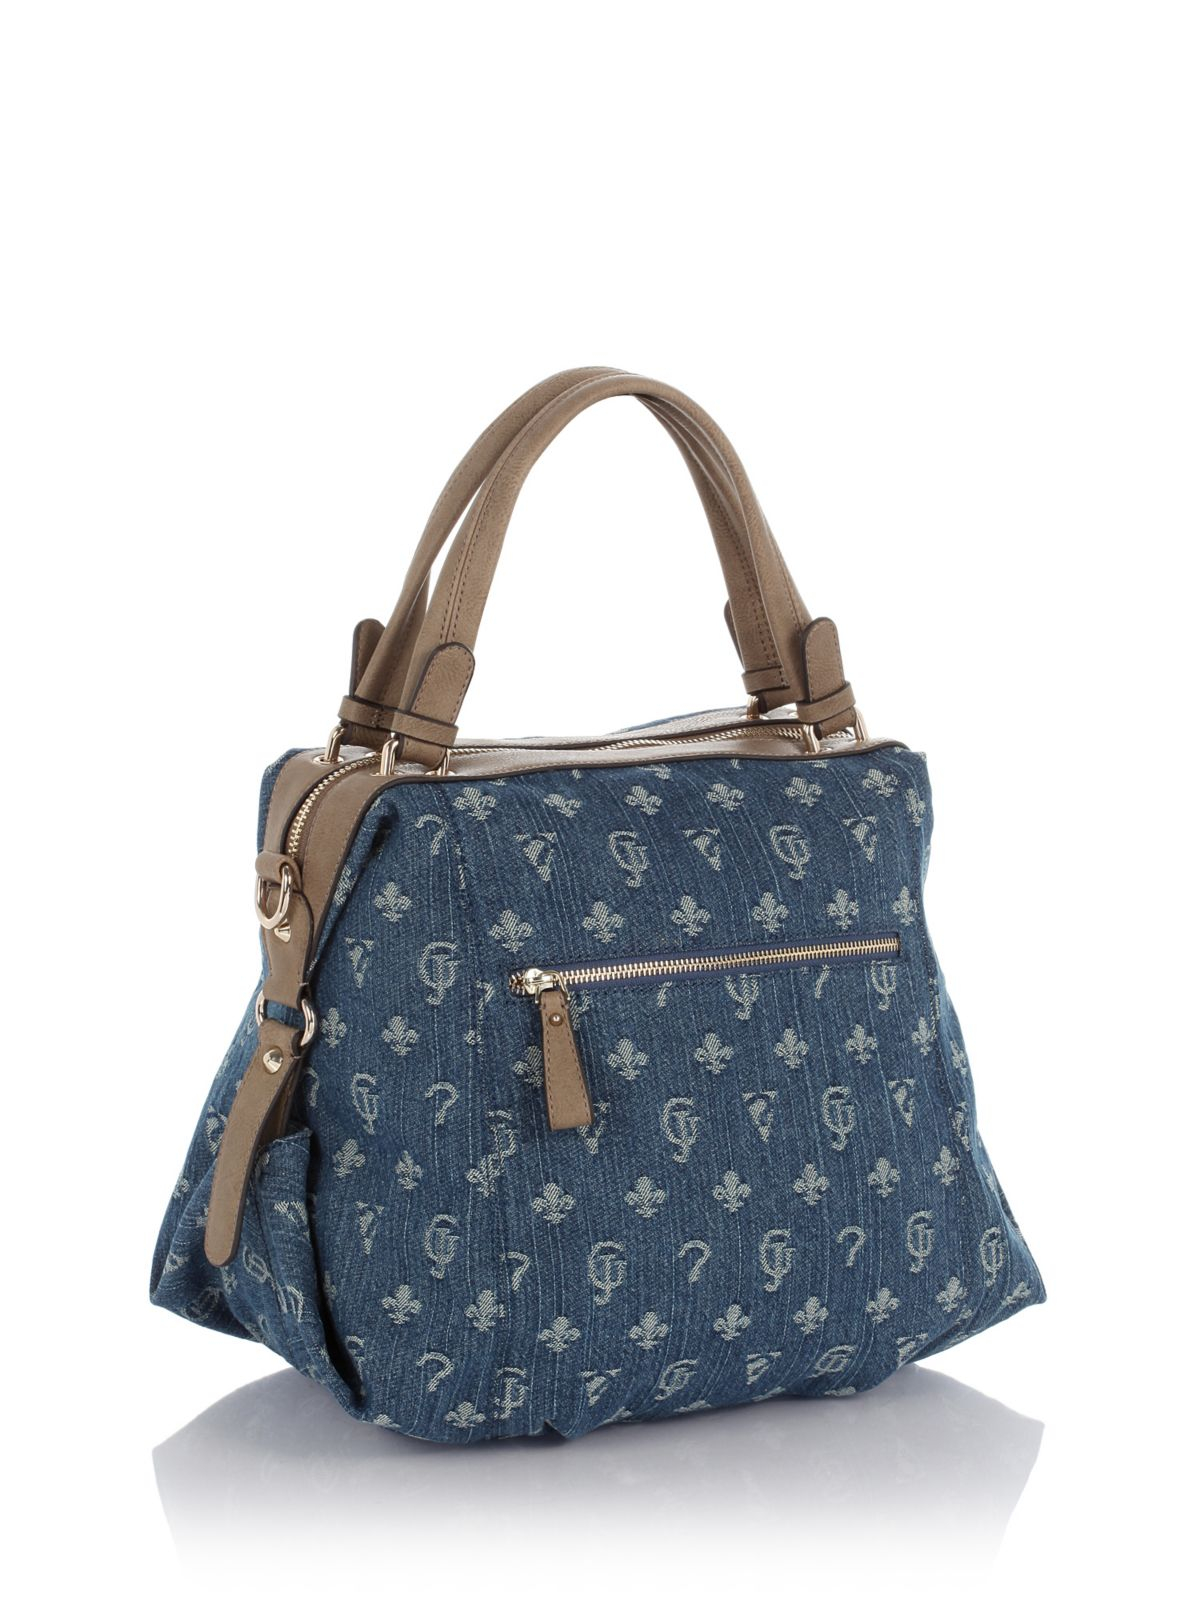 Guess Wild At Heart Lulu Denim Satchel Bag in Blue | Lyst